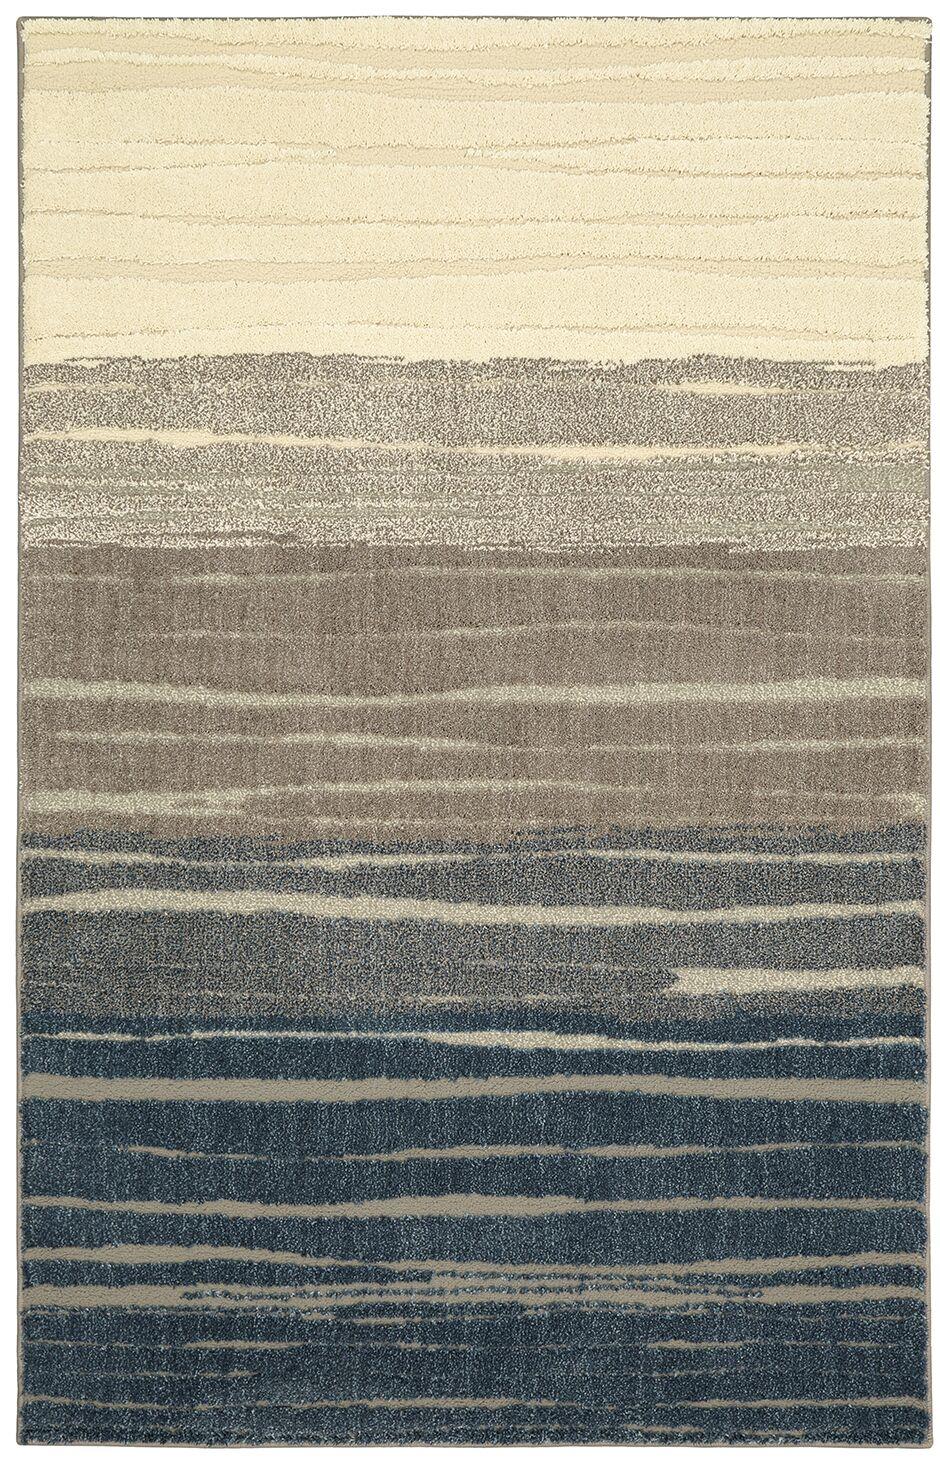 Pagosa Blue/Gray Area Rug Rug Size: Rectangle 8' x 10'